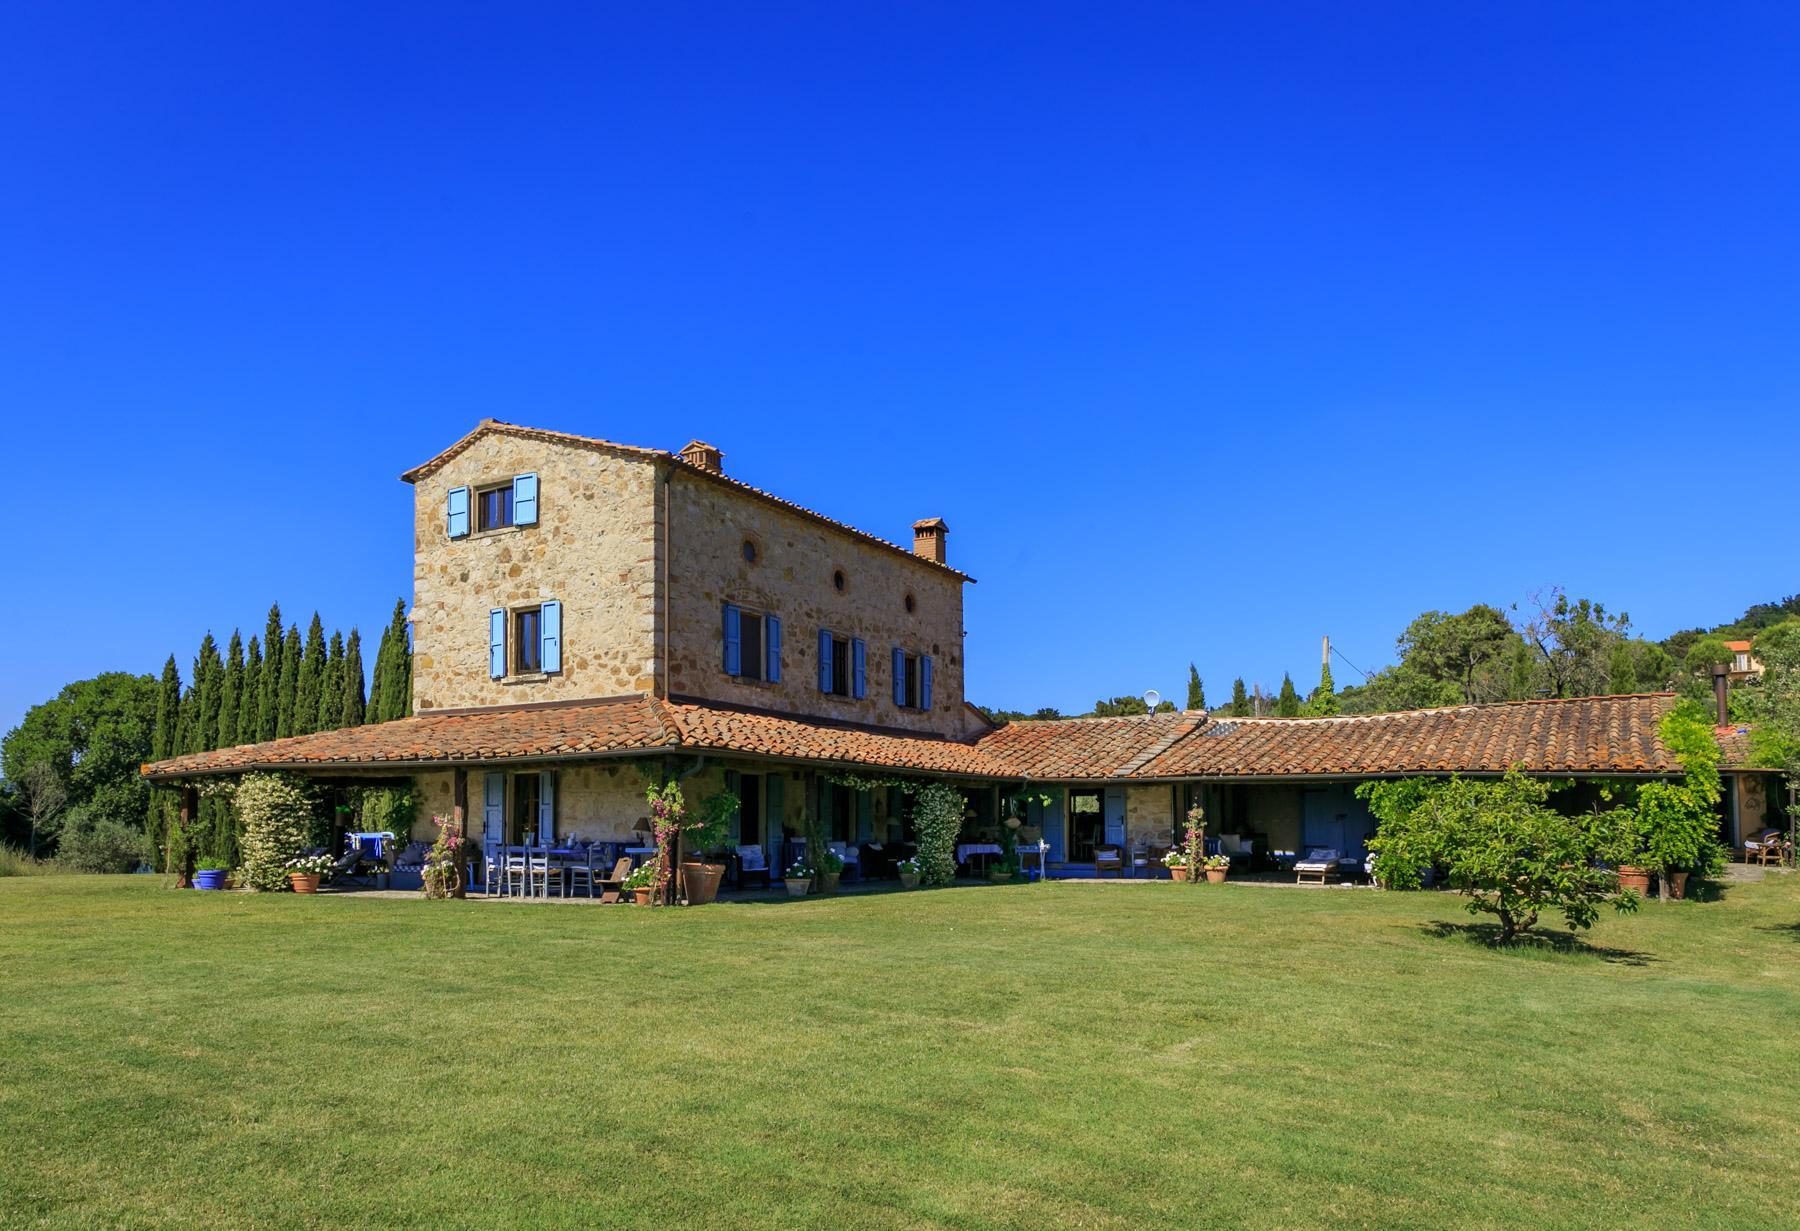 Belle villa toscane avec piscine - 5